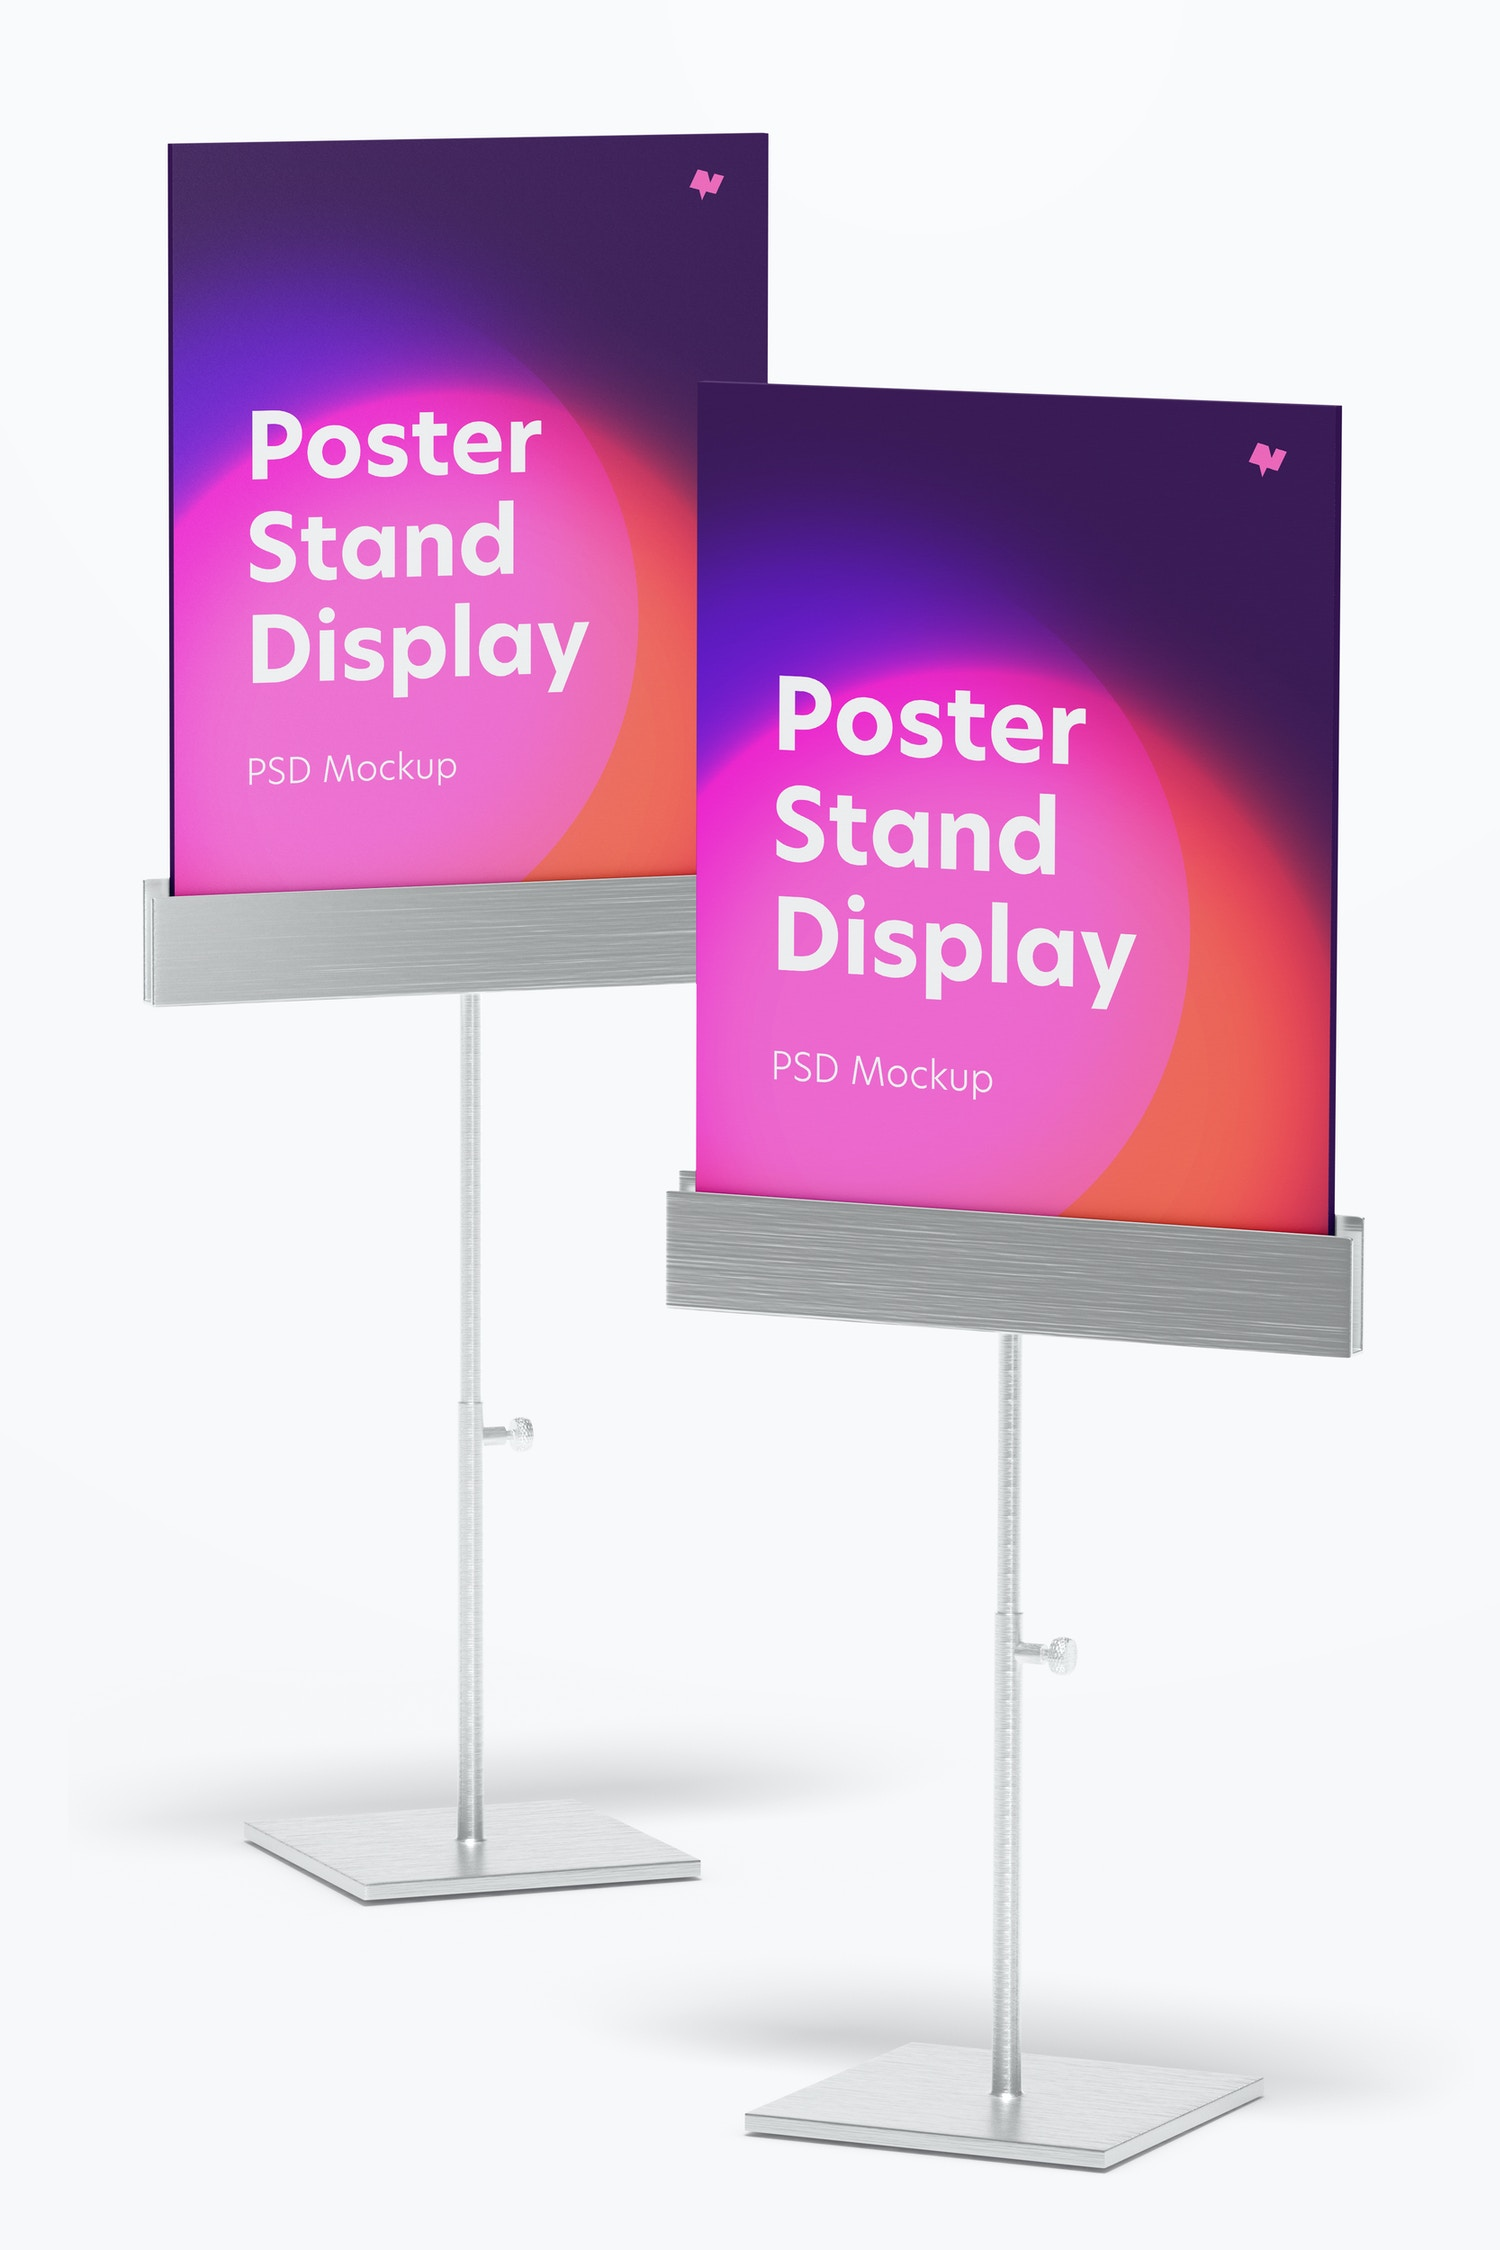 Metallic Poster Stands Display Mockup